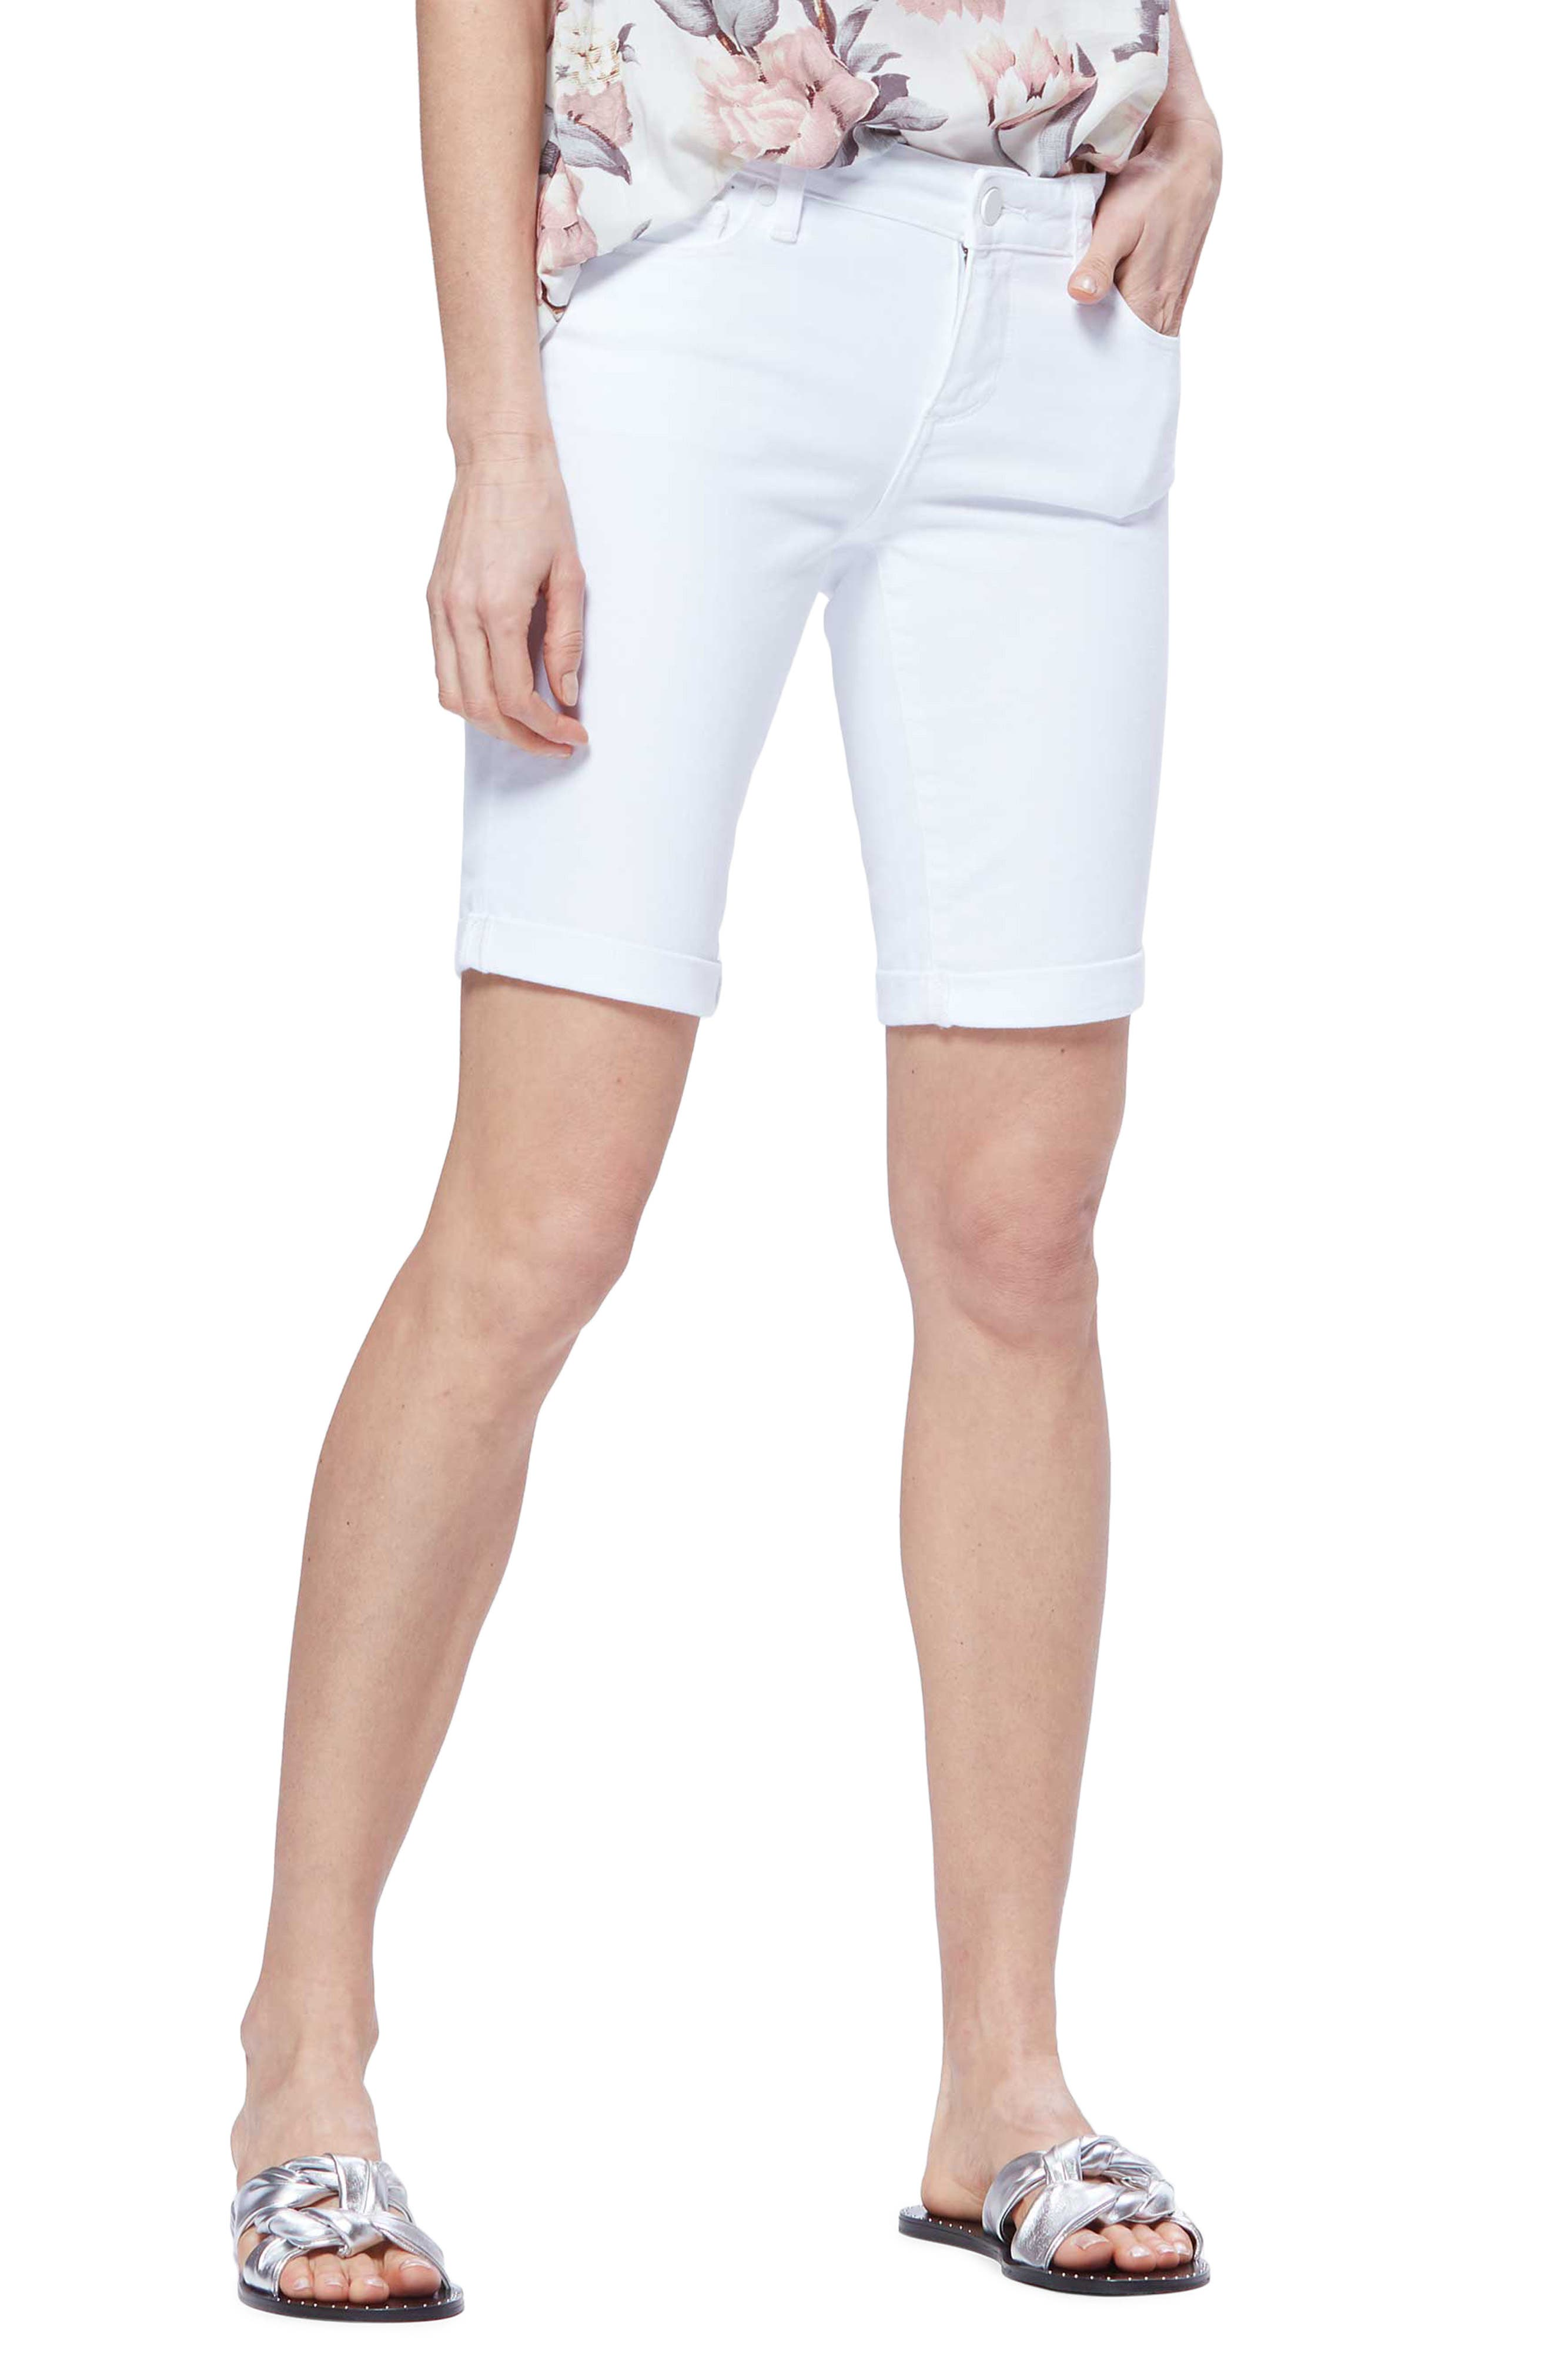 PAIGE Jax Denim Bermuda Shorts, Main, color, CRISP WHITE